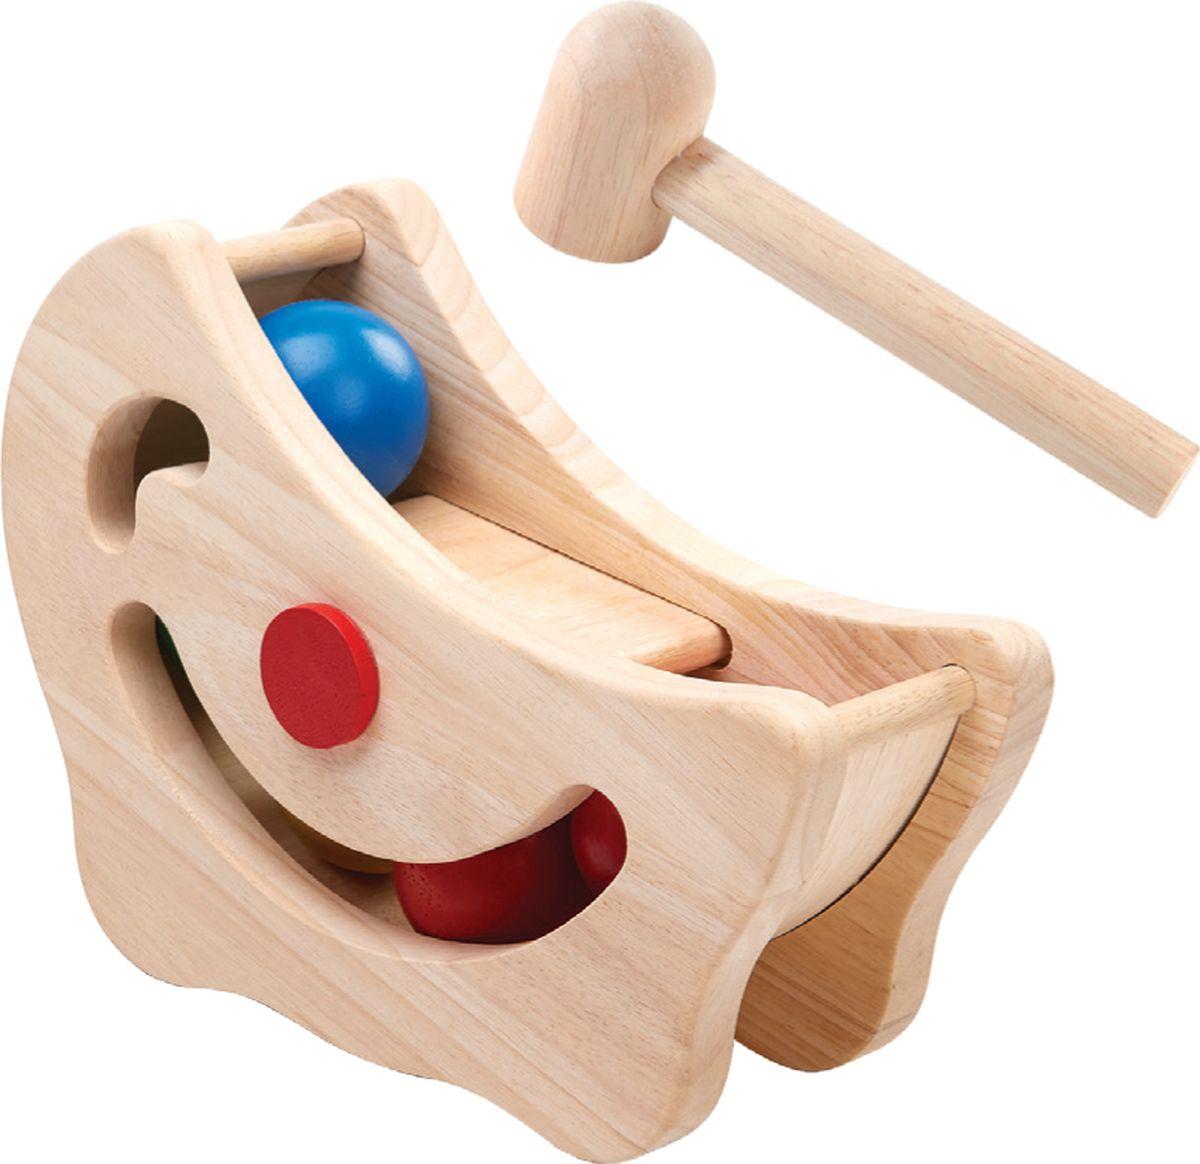 Plan Toys Развивающая игрушка Горка с шарами каталка утка plan toys